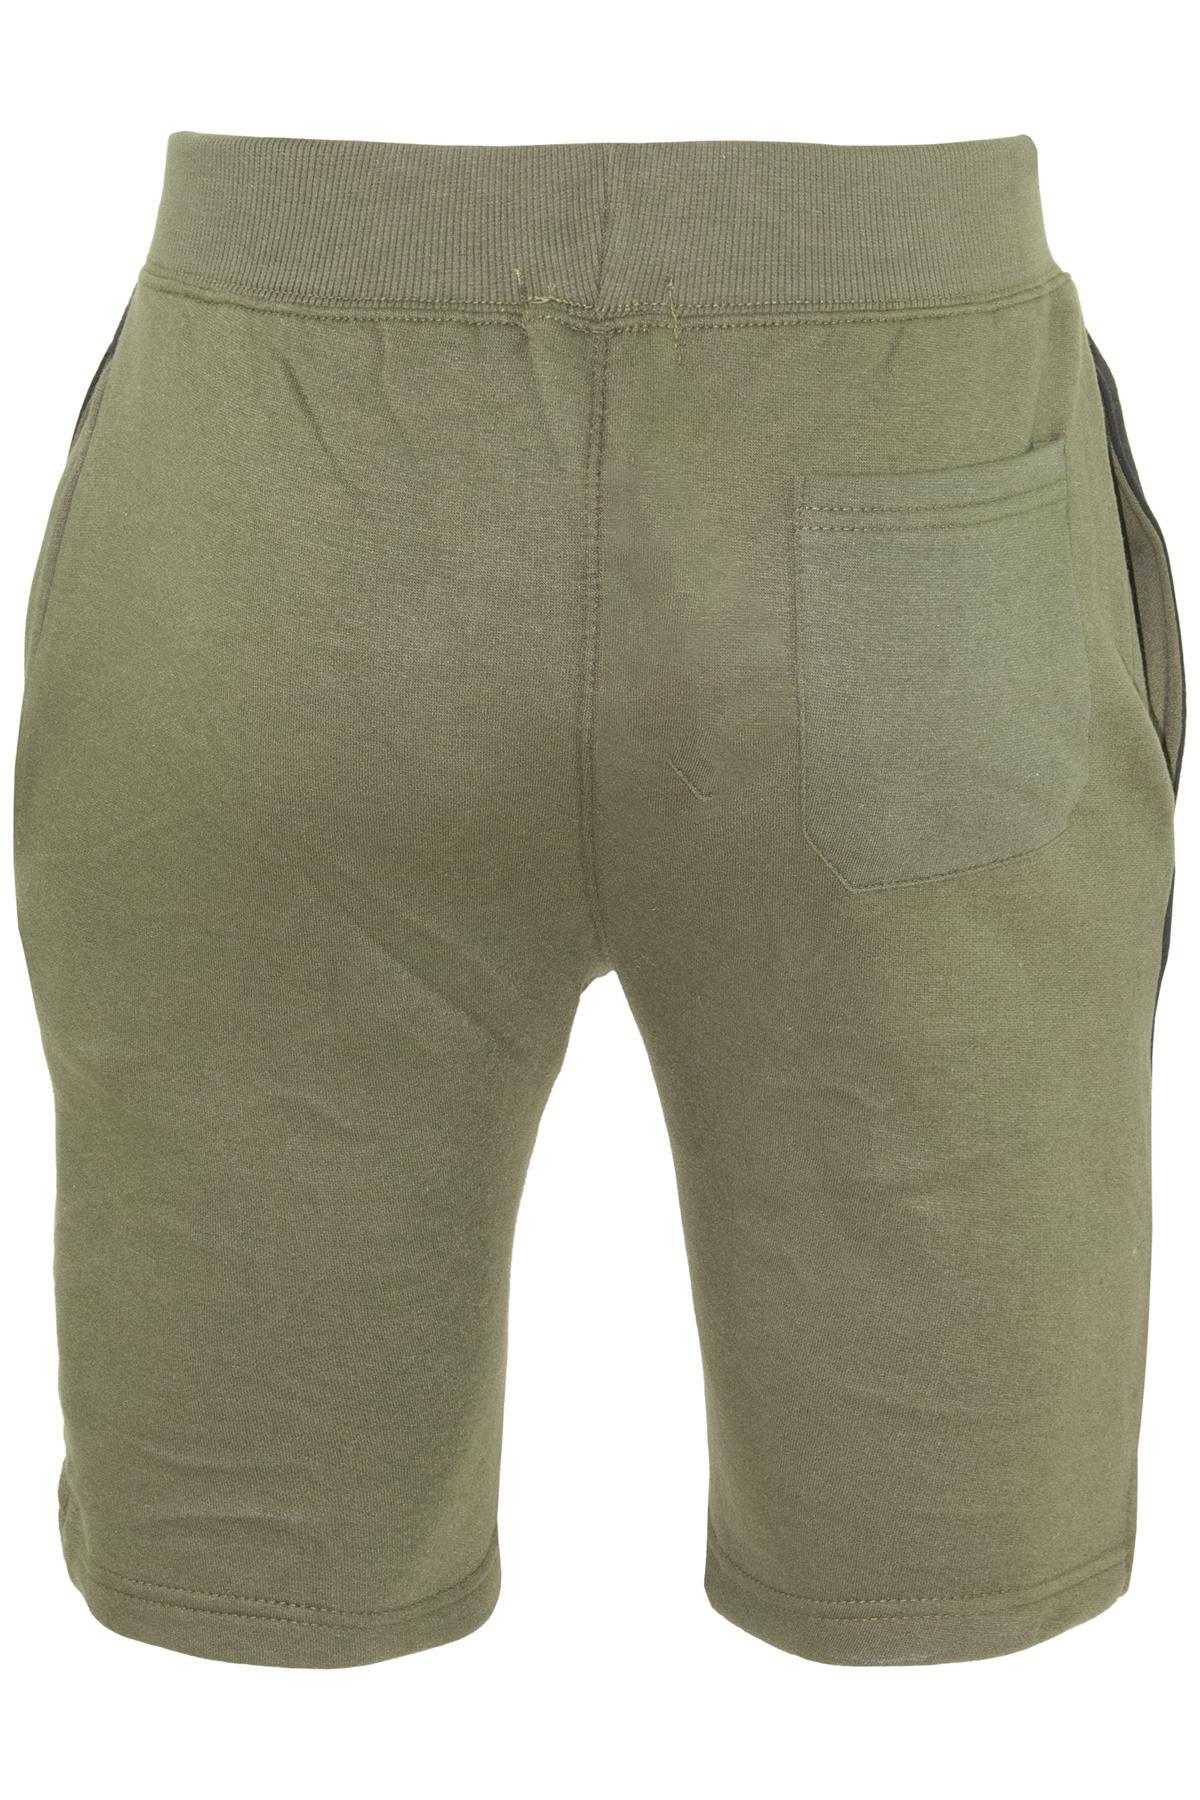 Mens-Contrast-Panel-Running-Summer-Side-Slit-Knee-Length-Fleece-Bottoms-Shorts thumbnail 5